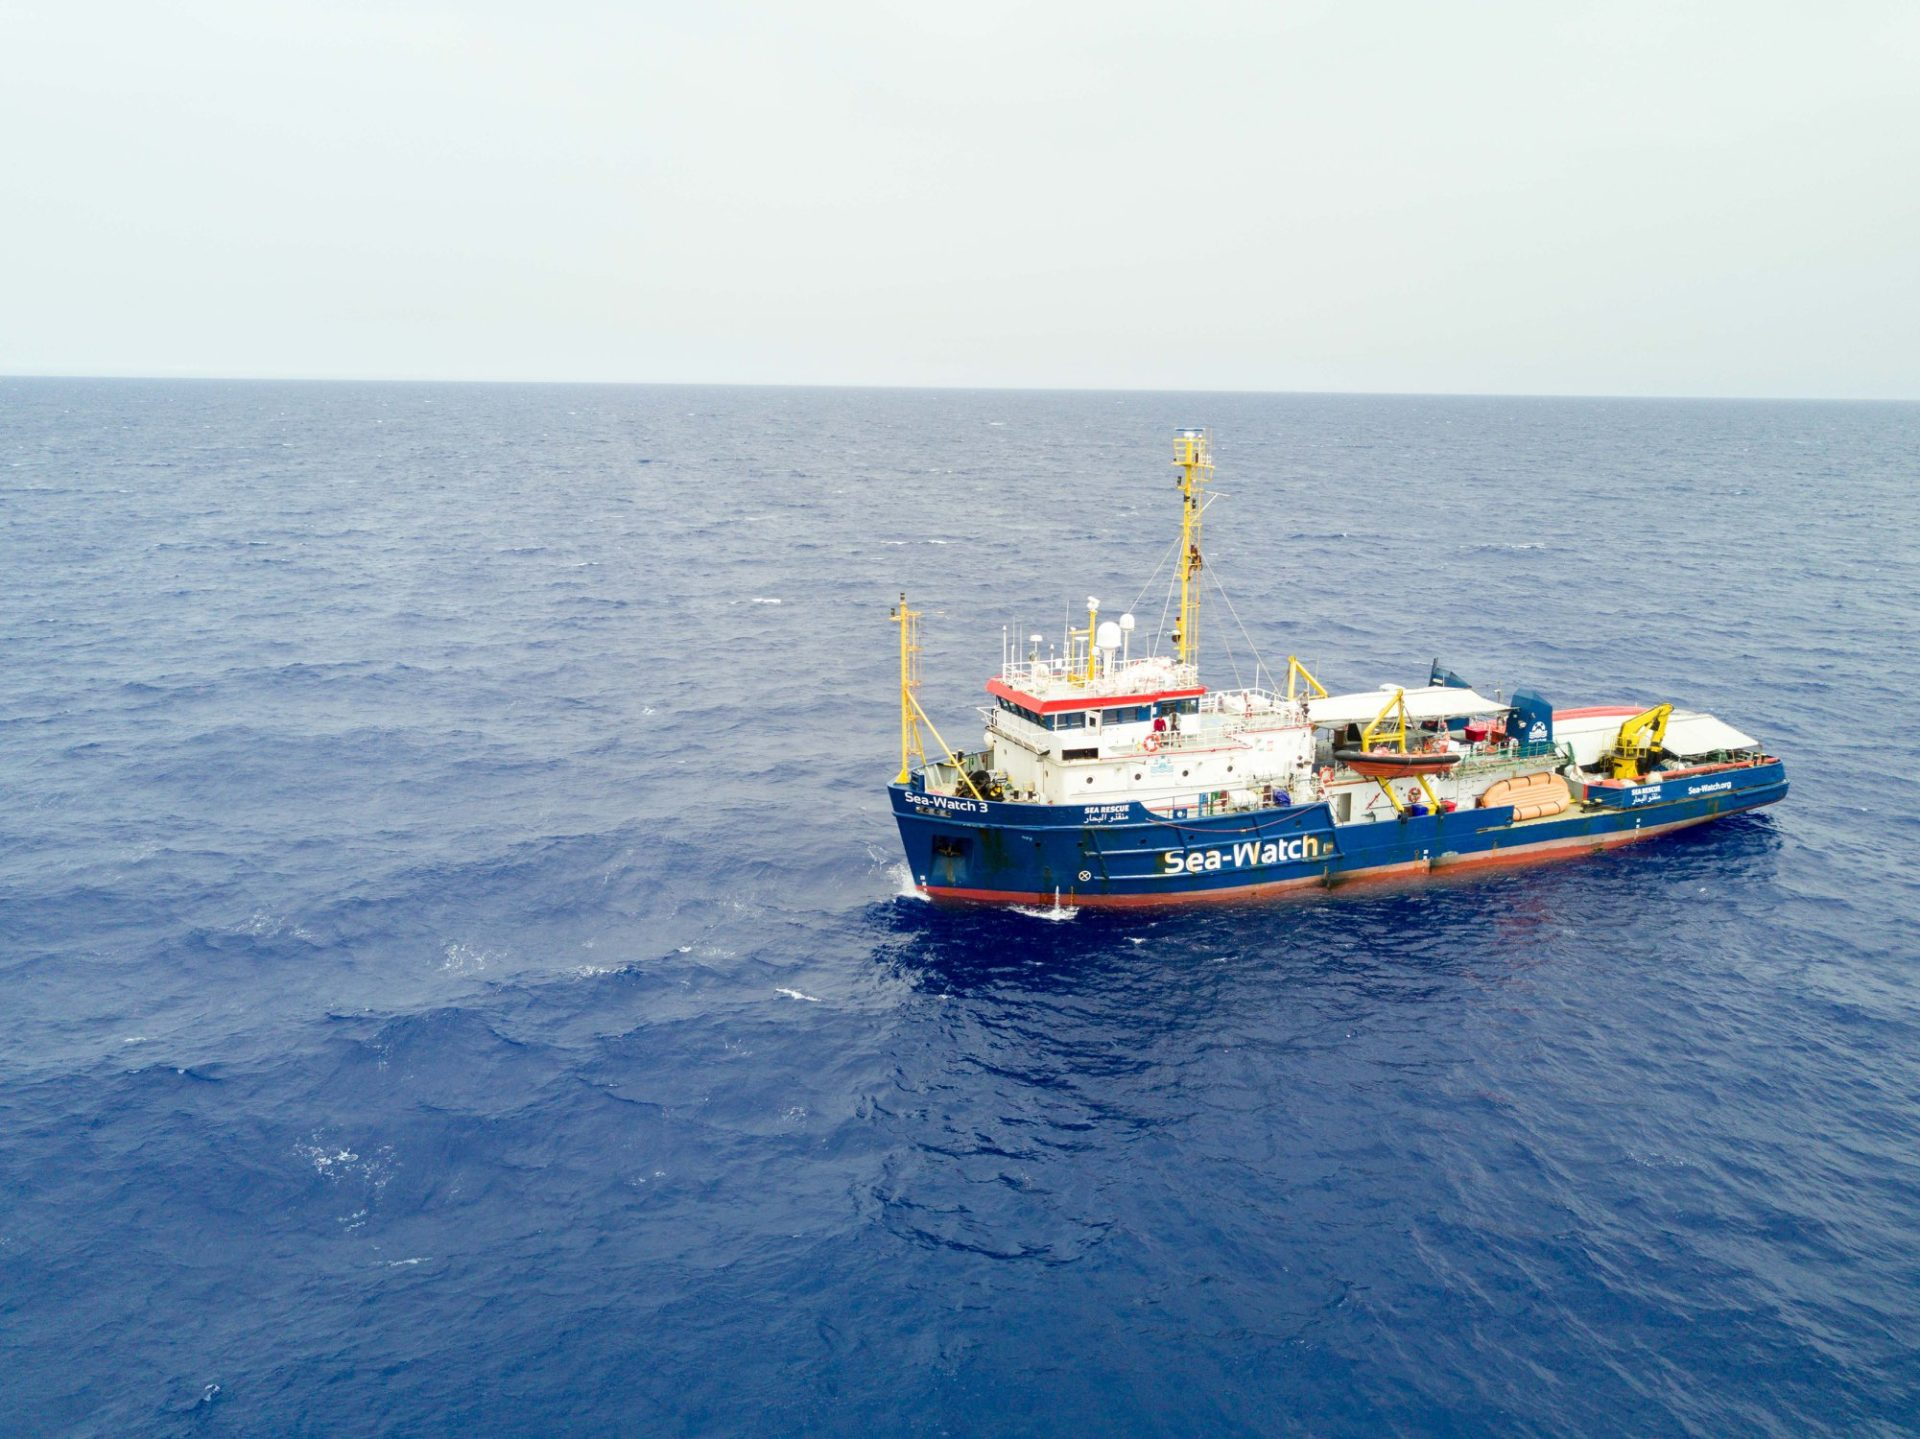 Sea Watch 3 Carola Rackete Matteo Salvini